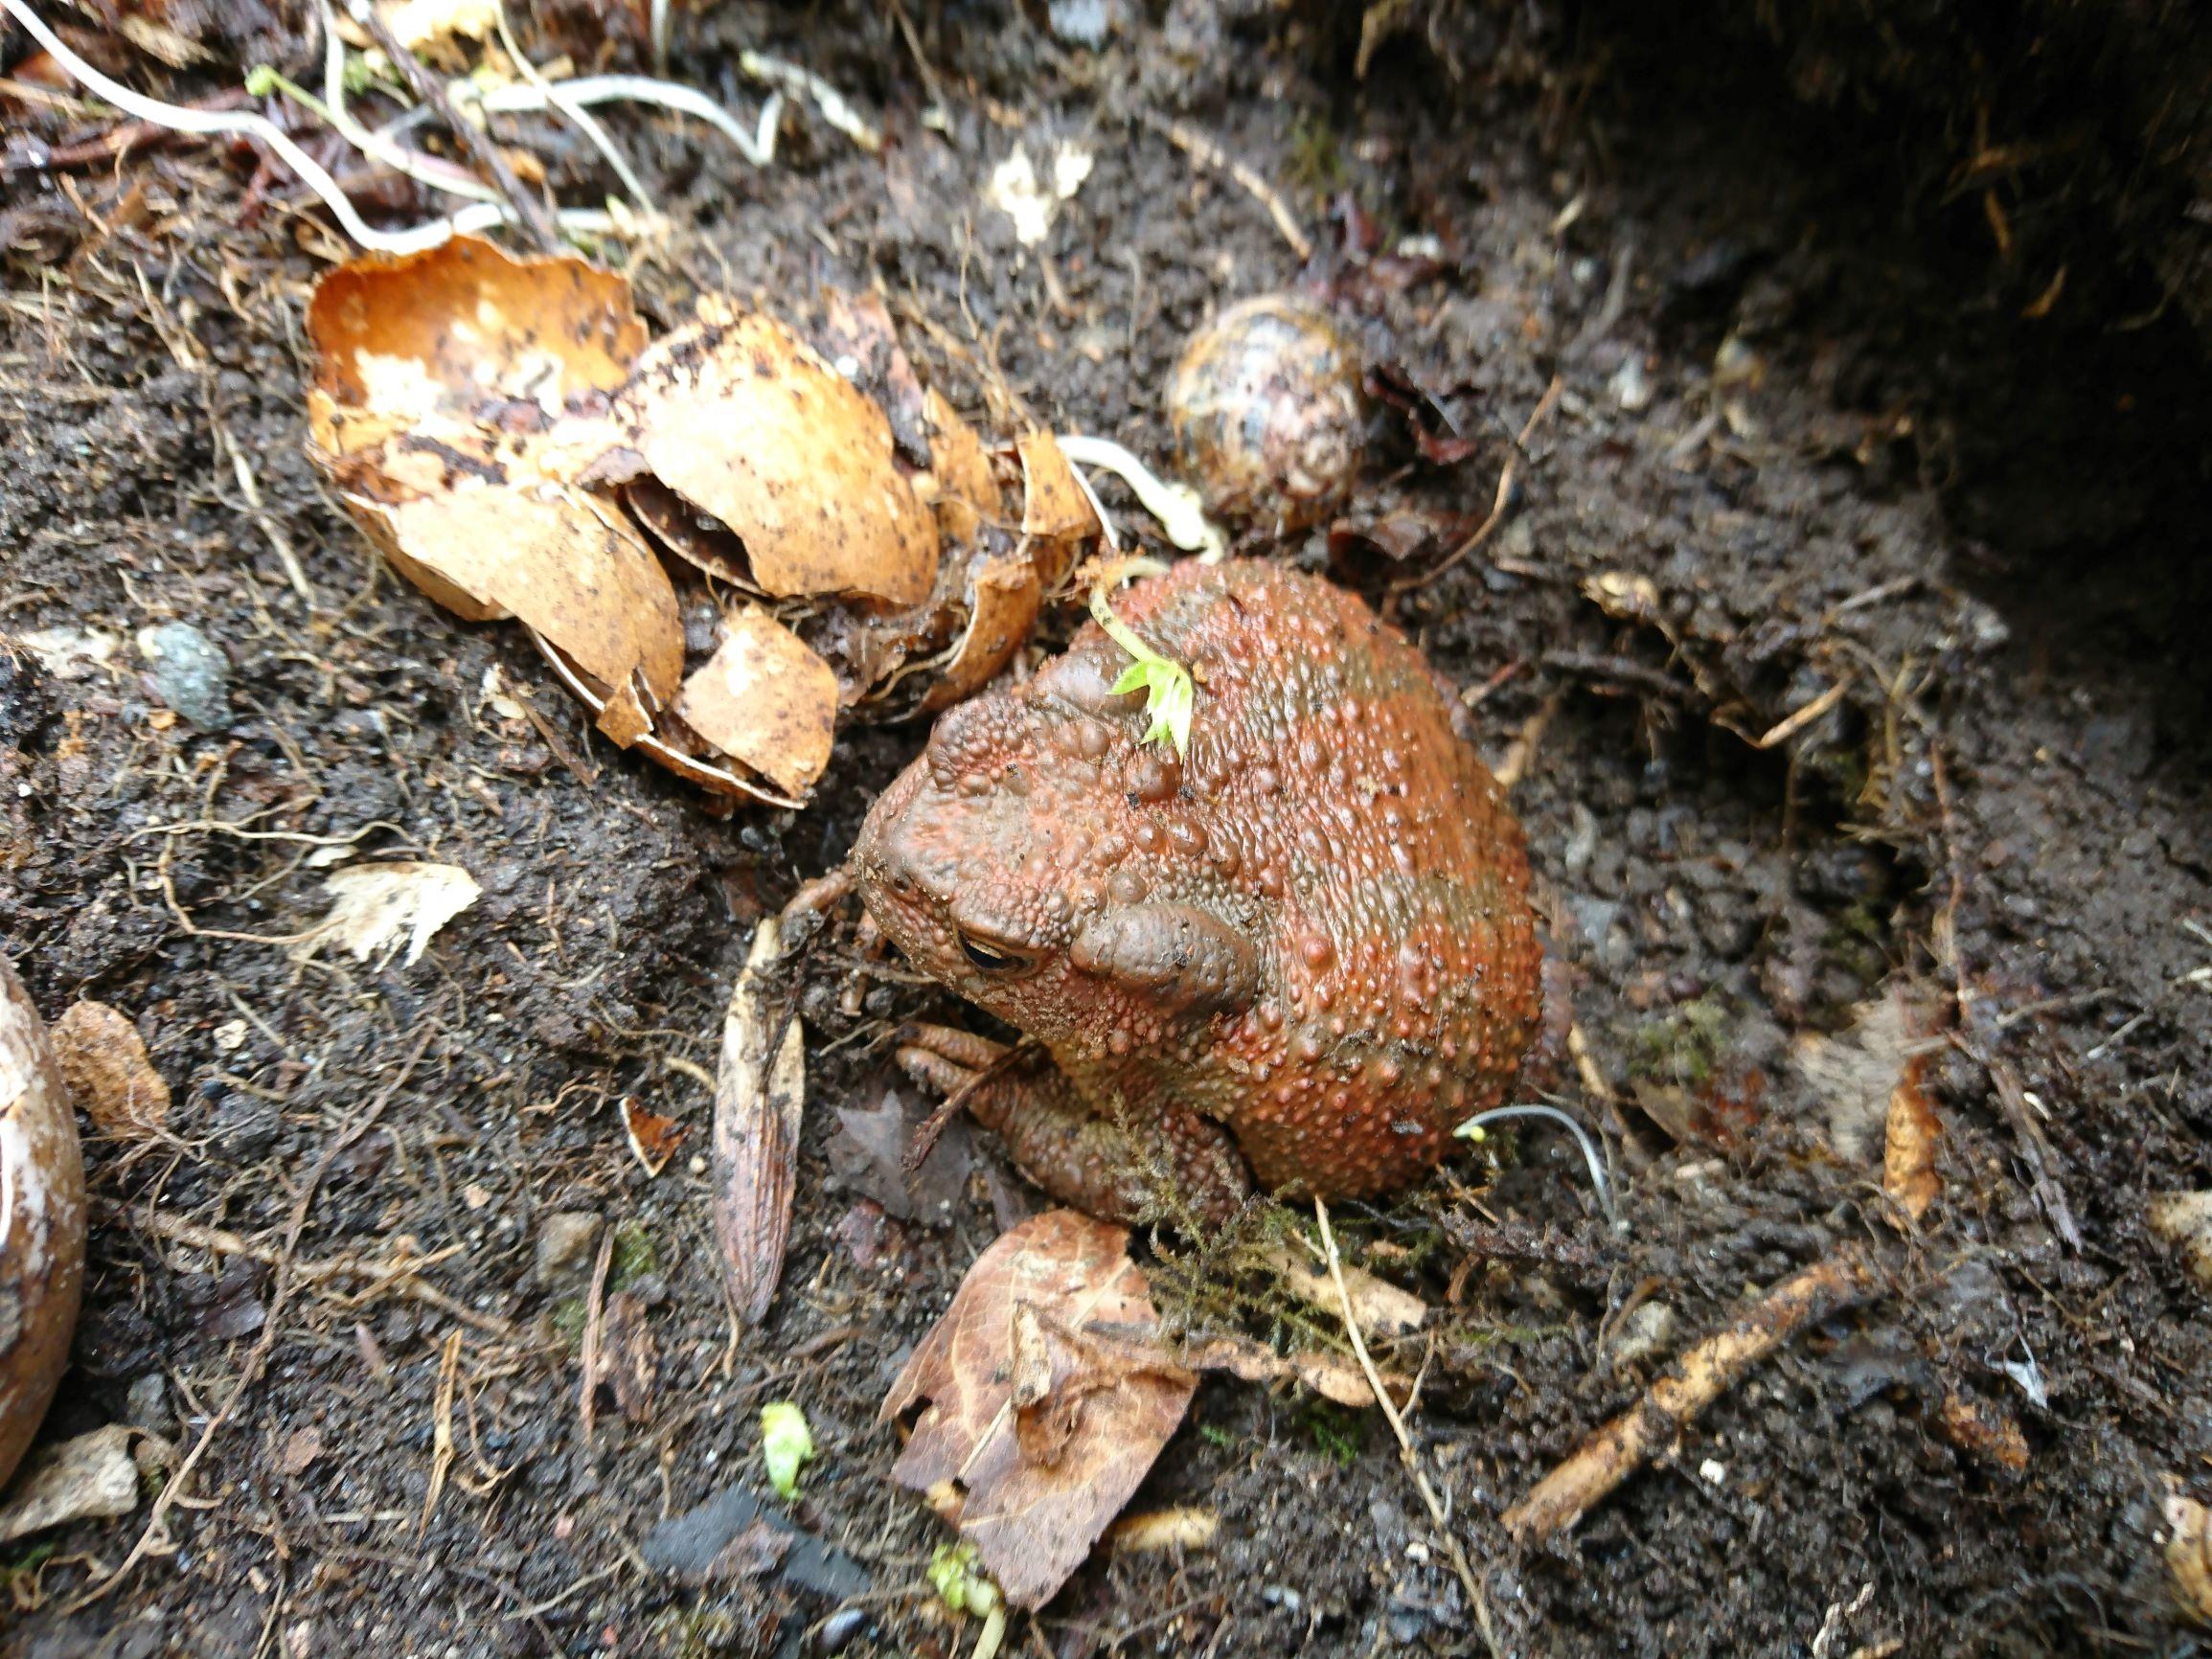 Orange coloured toad